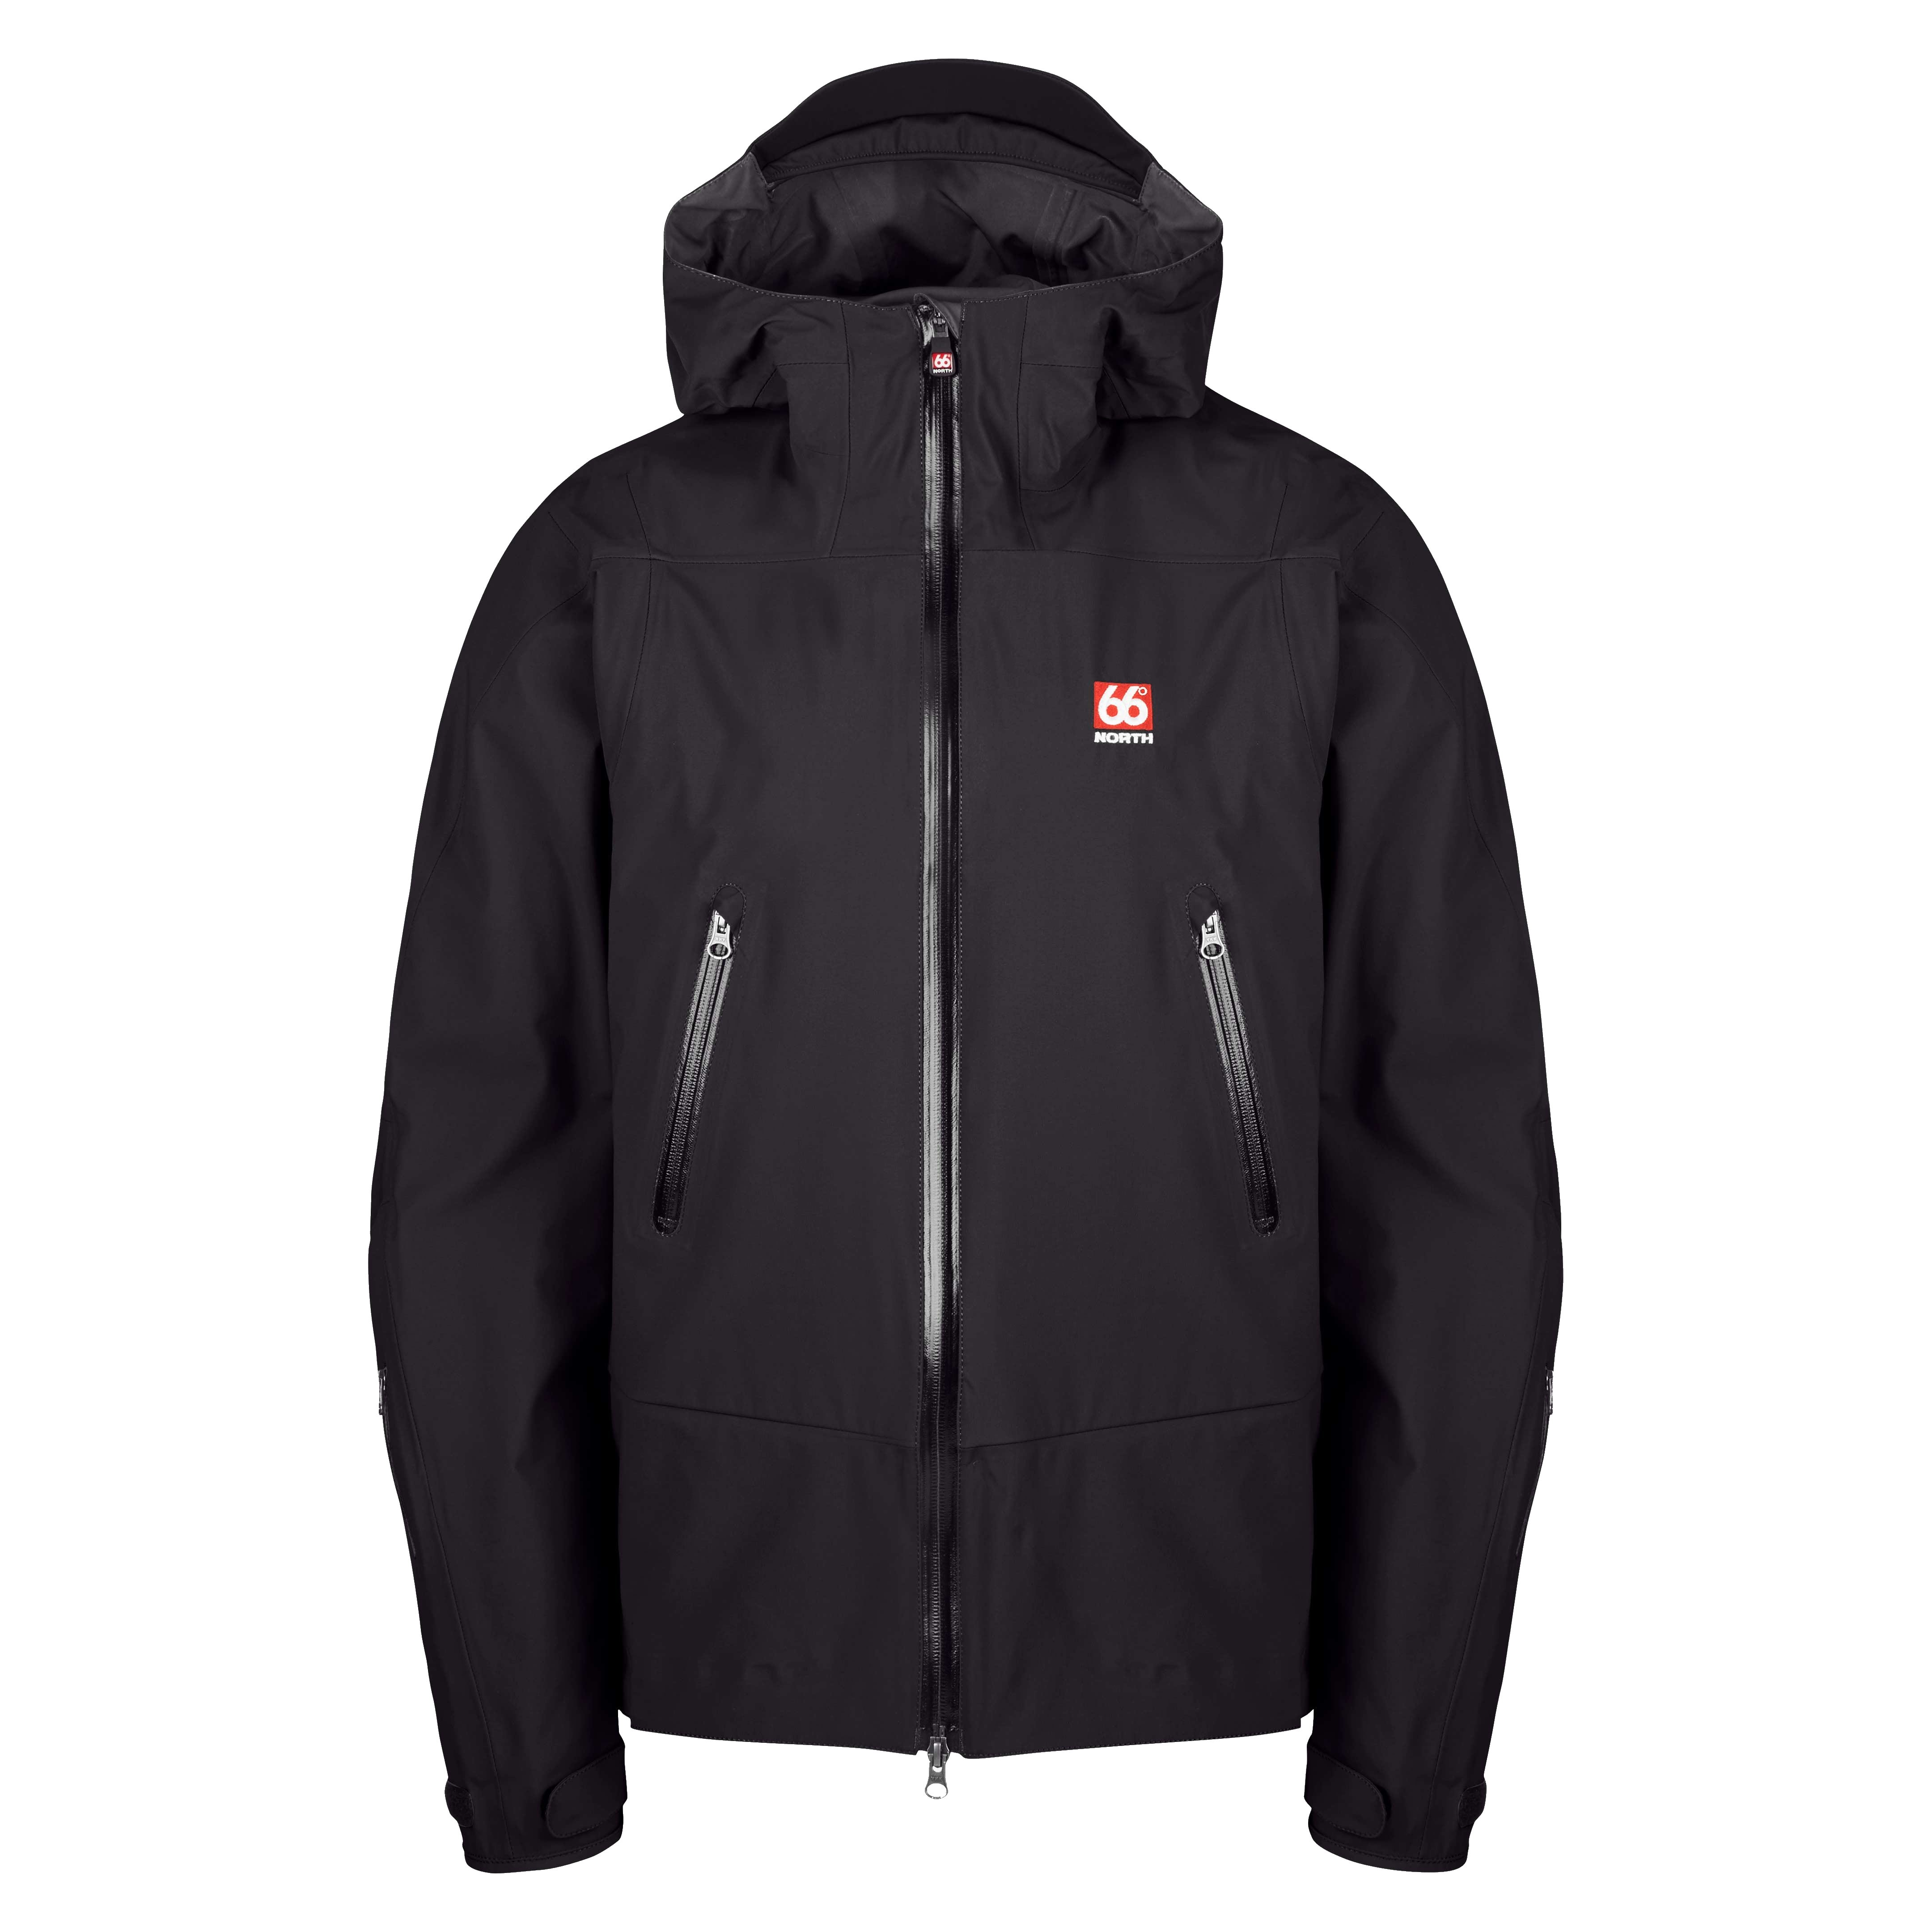 Snaefell Women's Neoshell Jacket